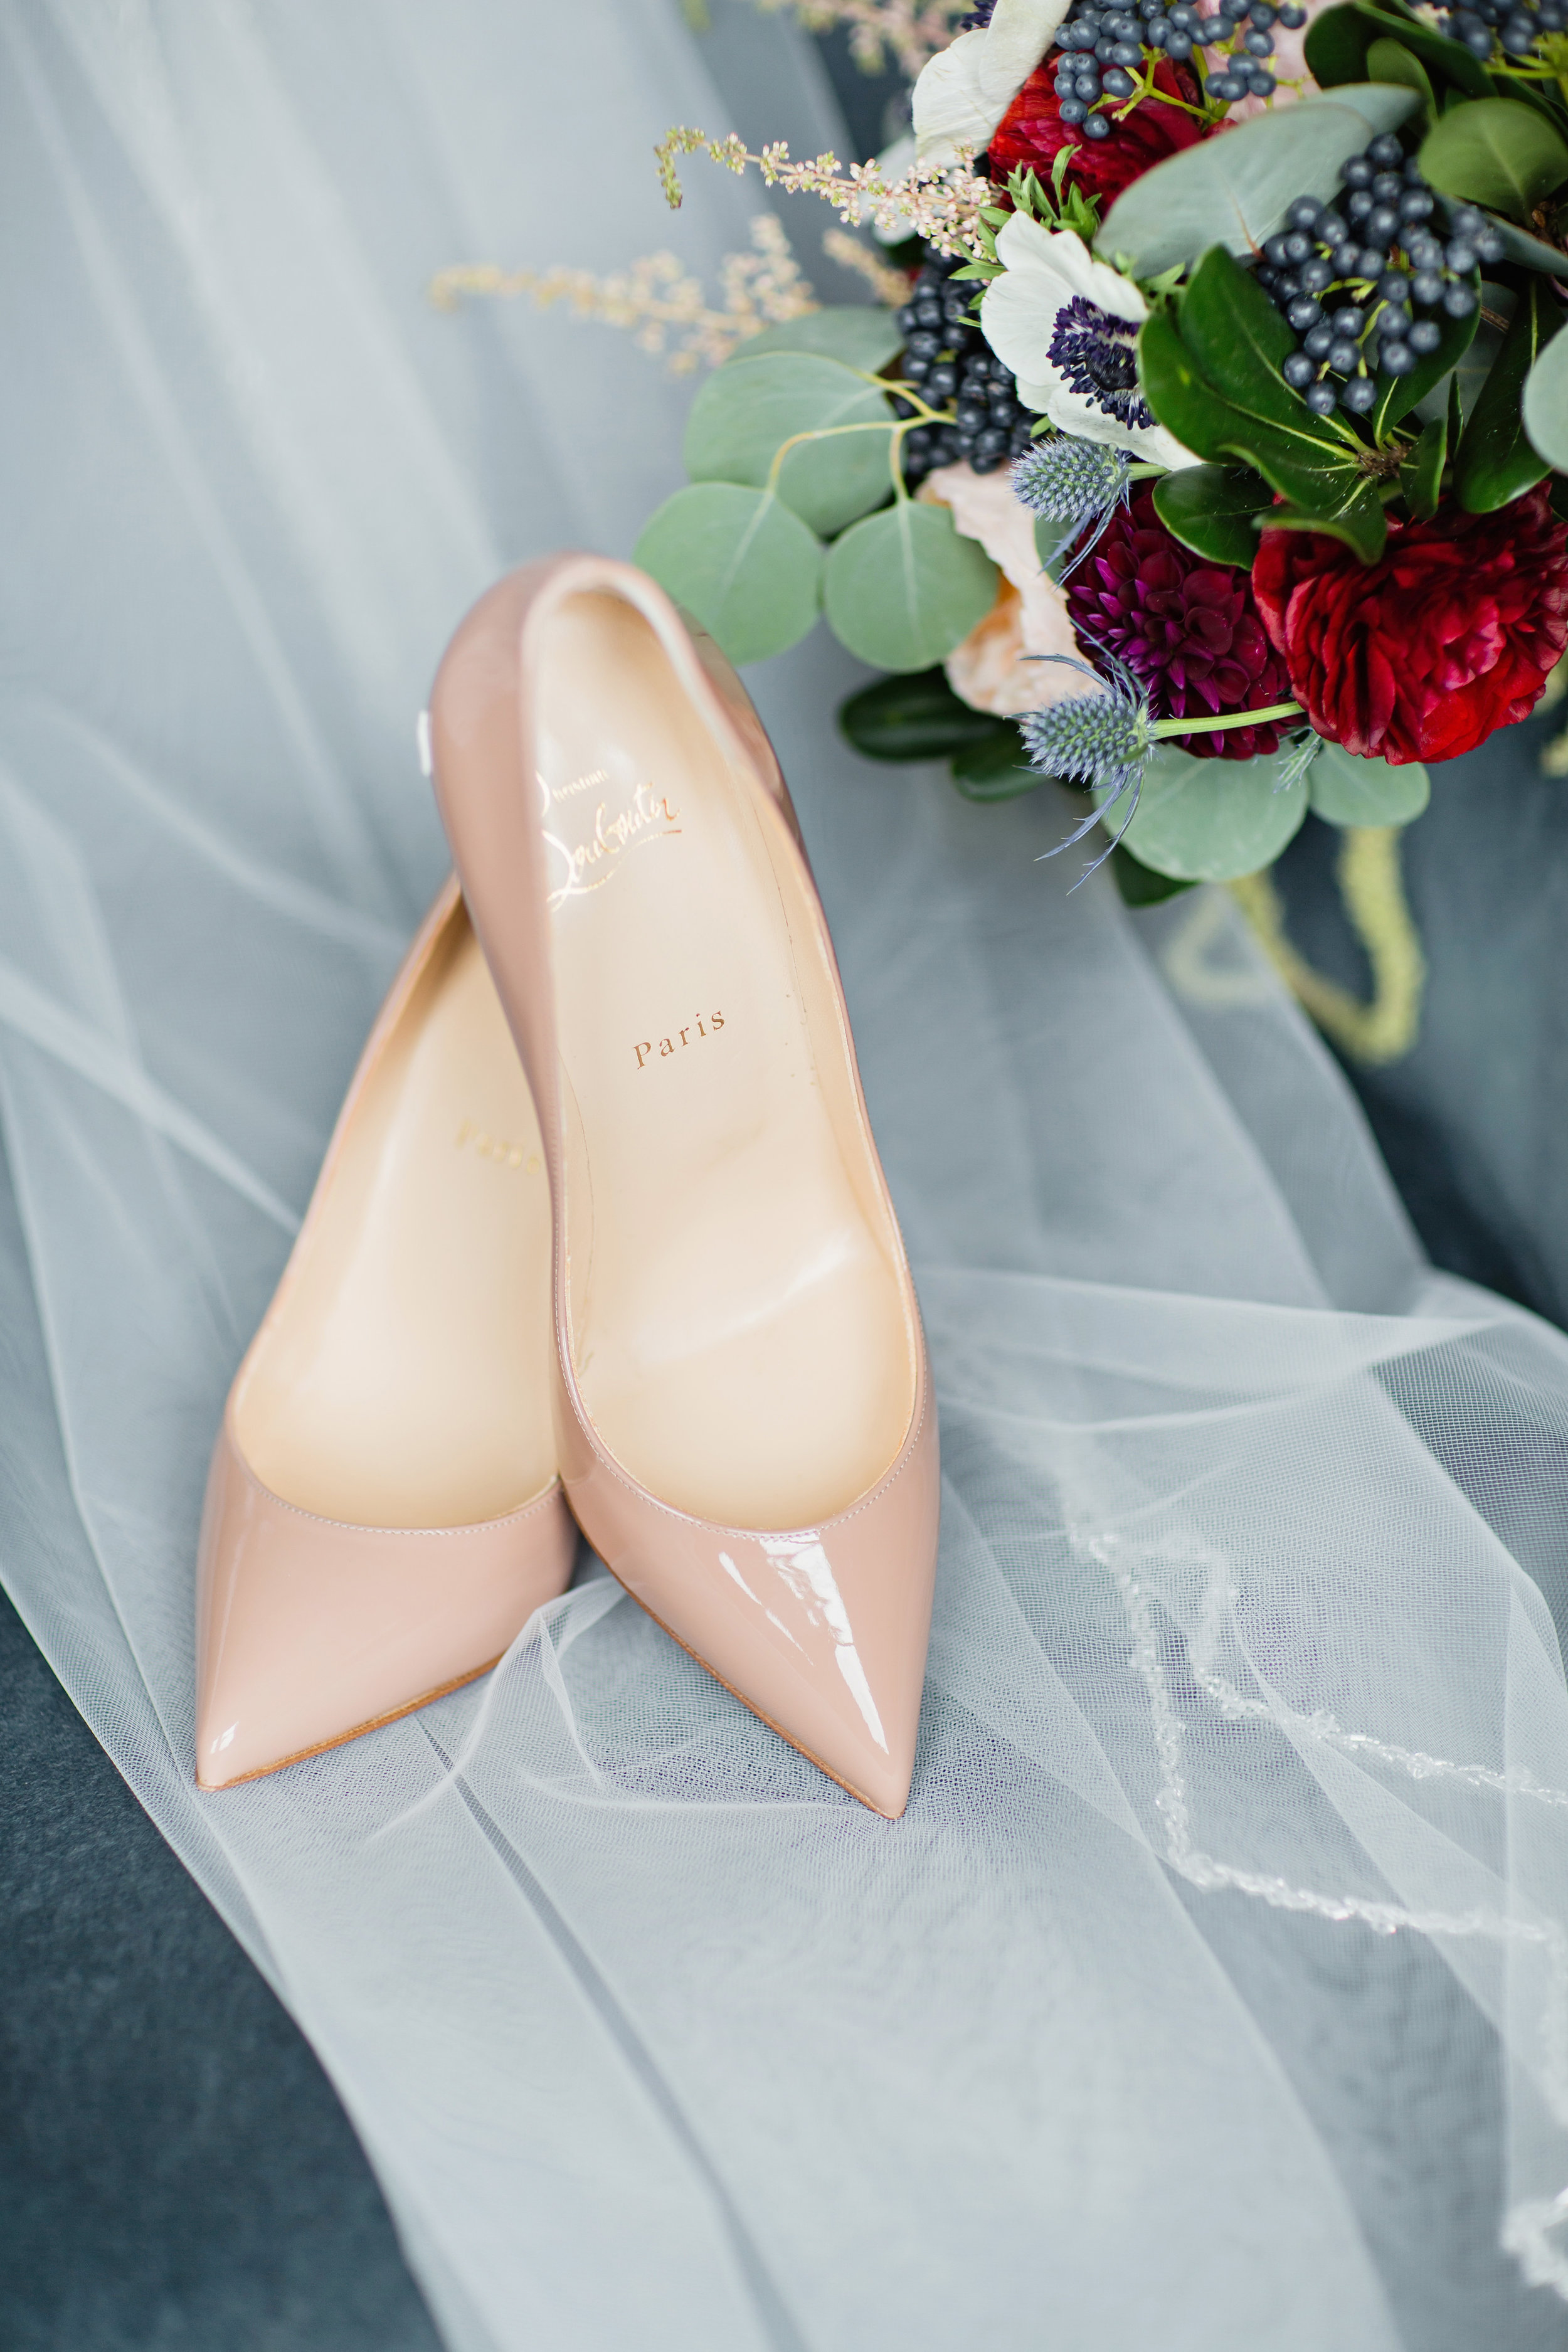 detroit-stylish-wedding-photographer-eryn-shea-photography-01.JPG